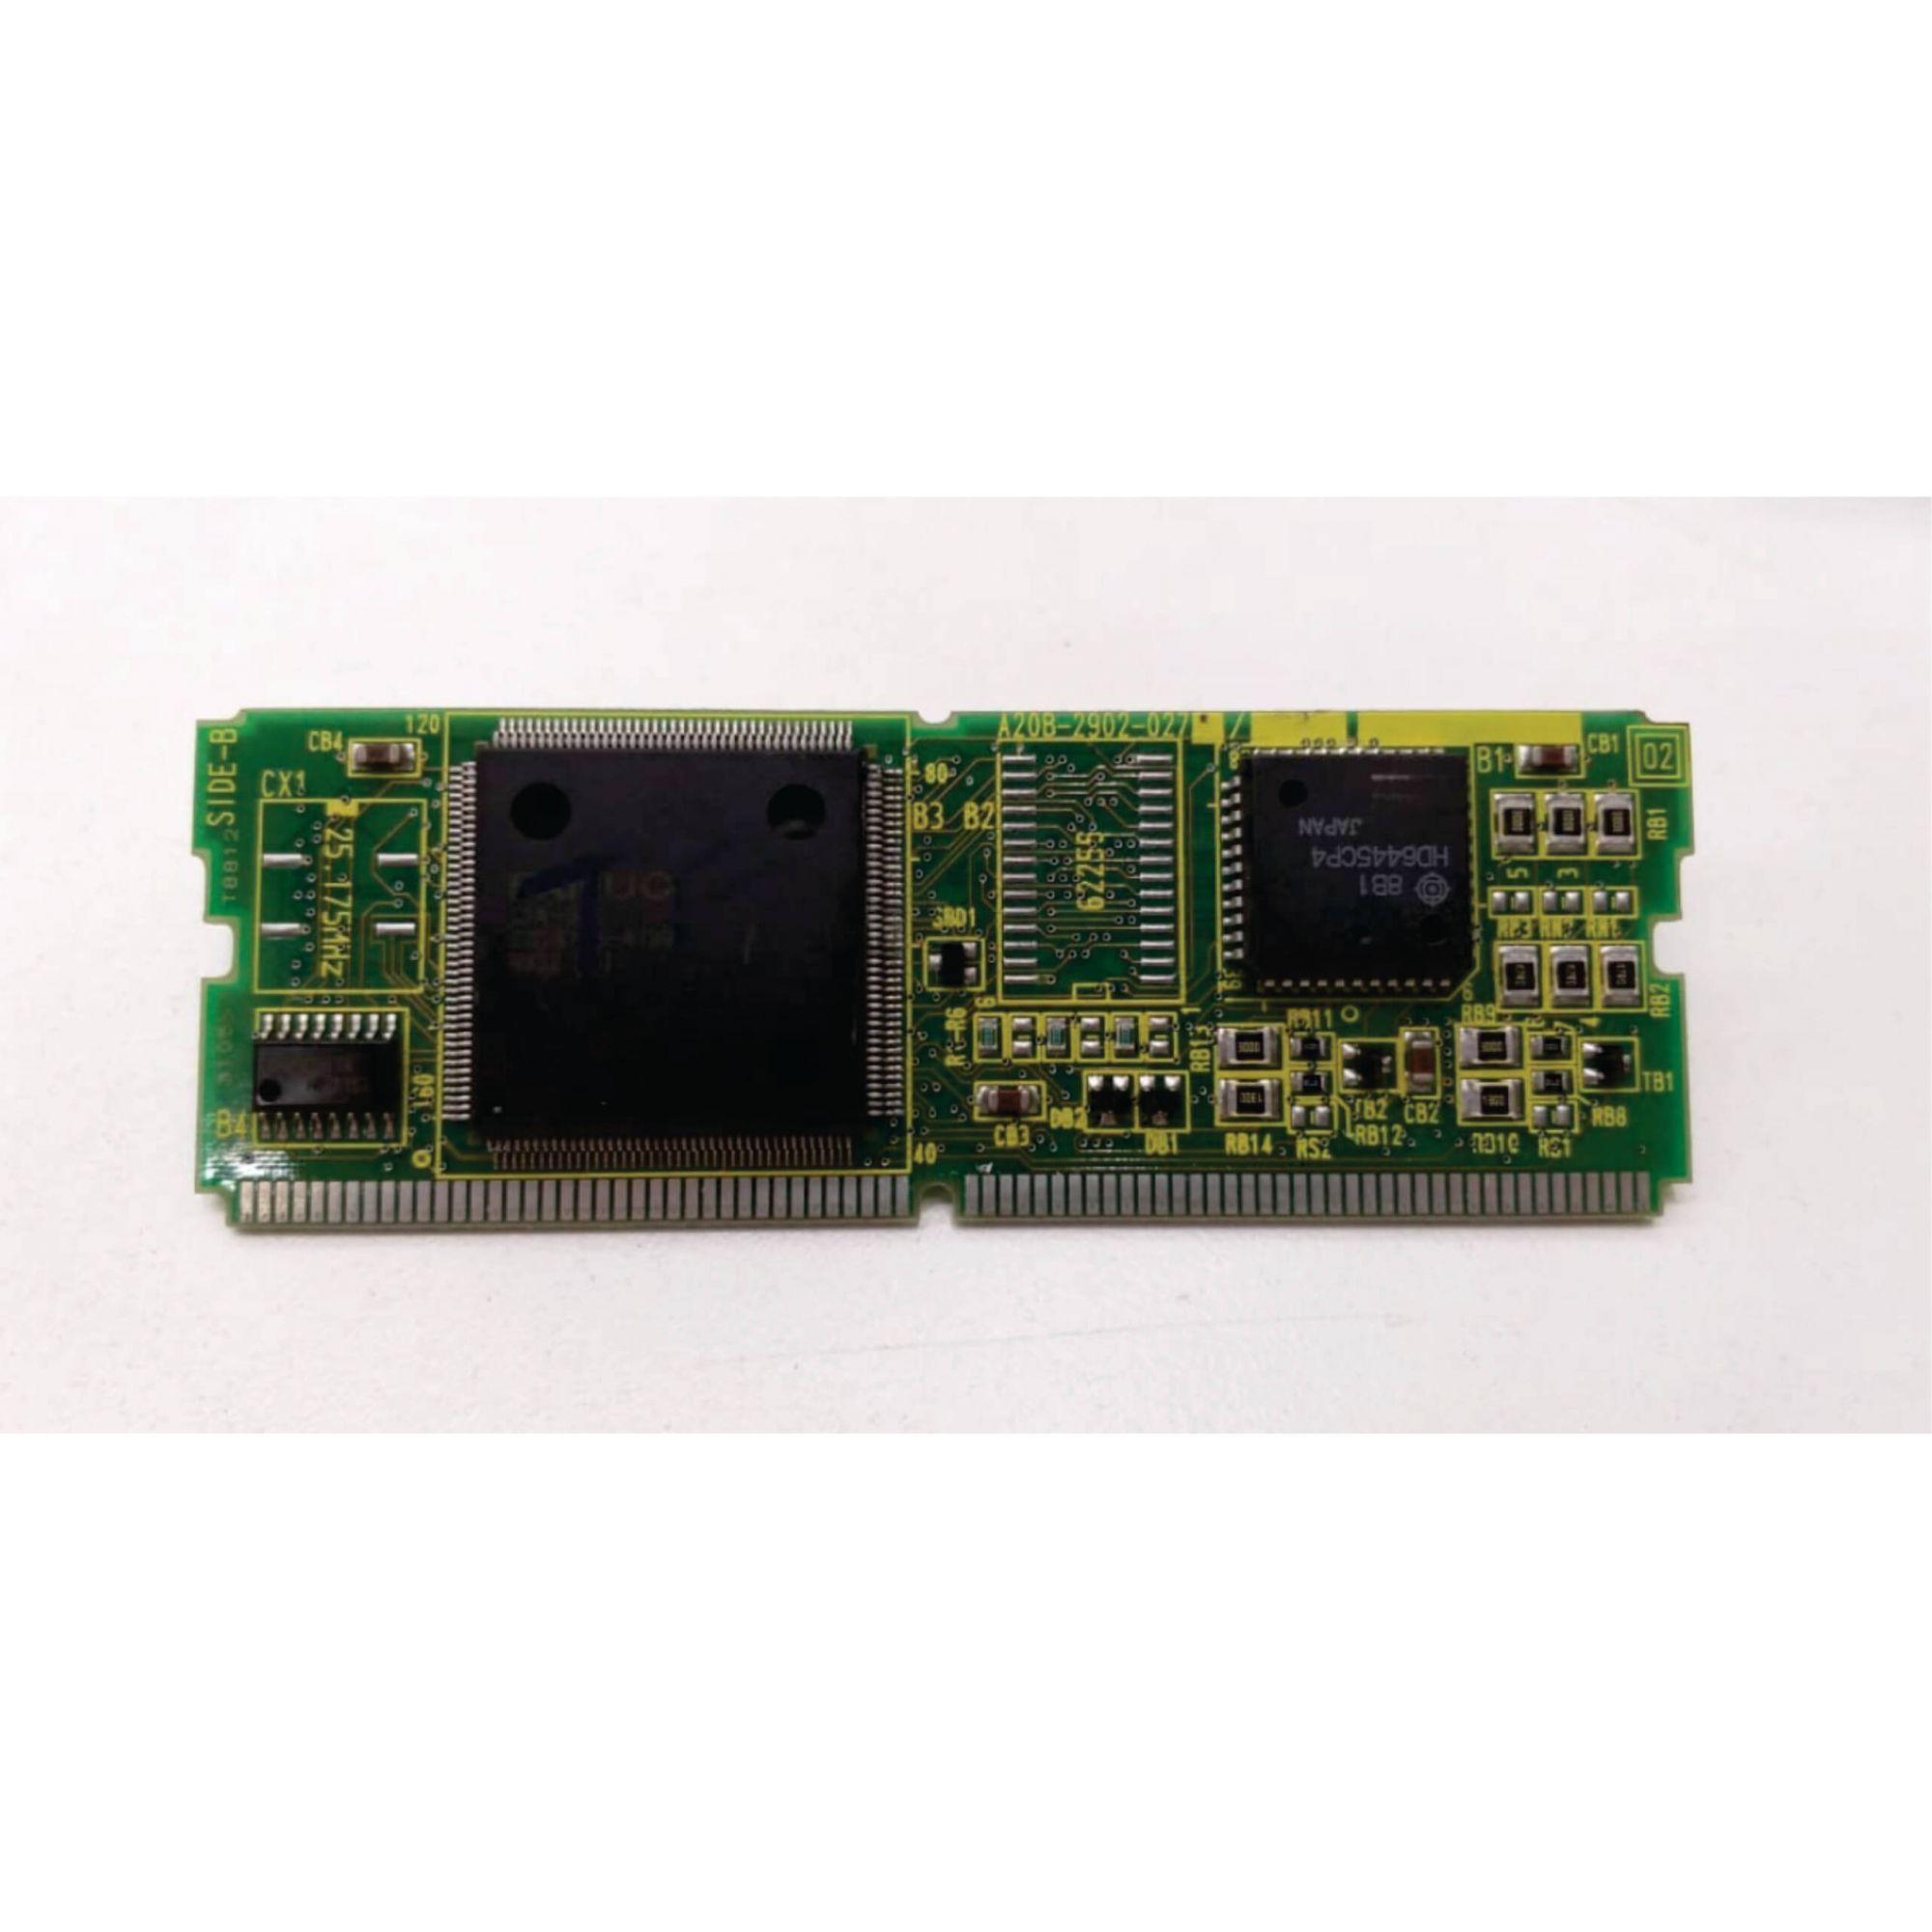 A20b-2902-0271 | PLACA VIDEO CNC | FANUC